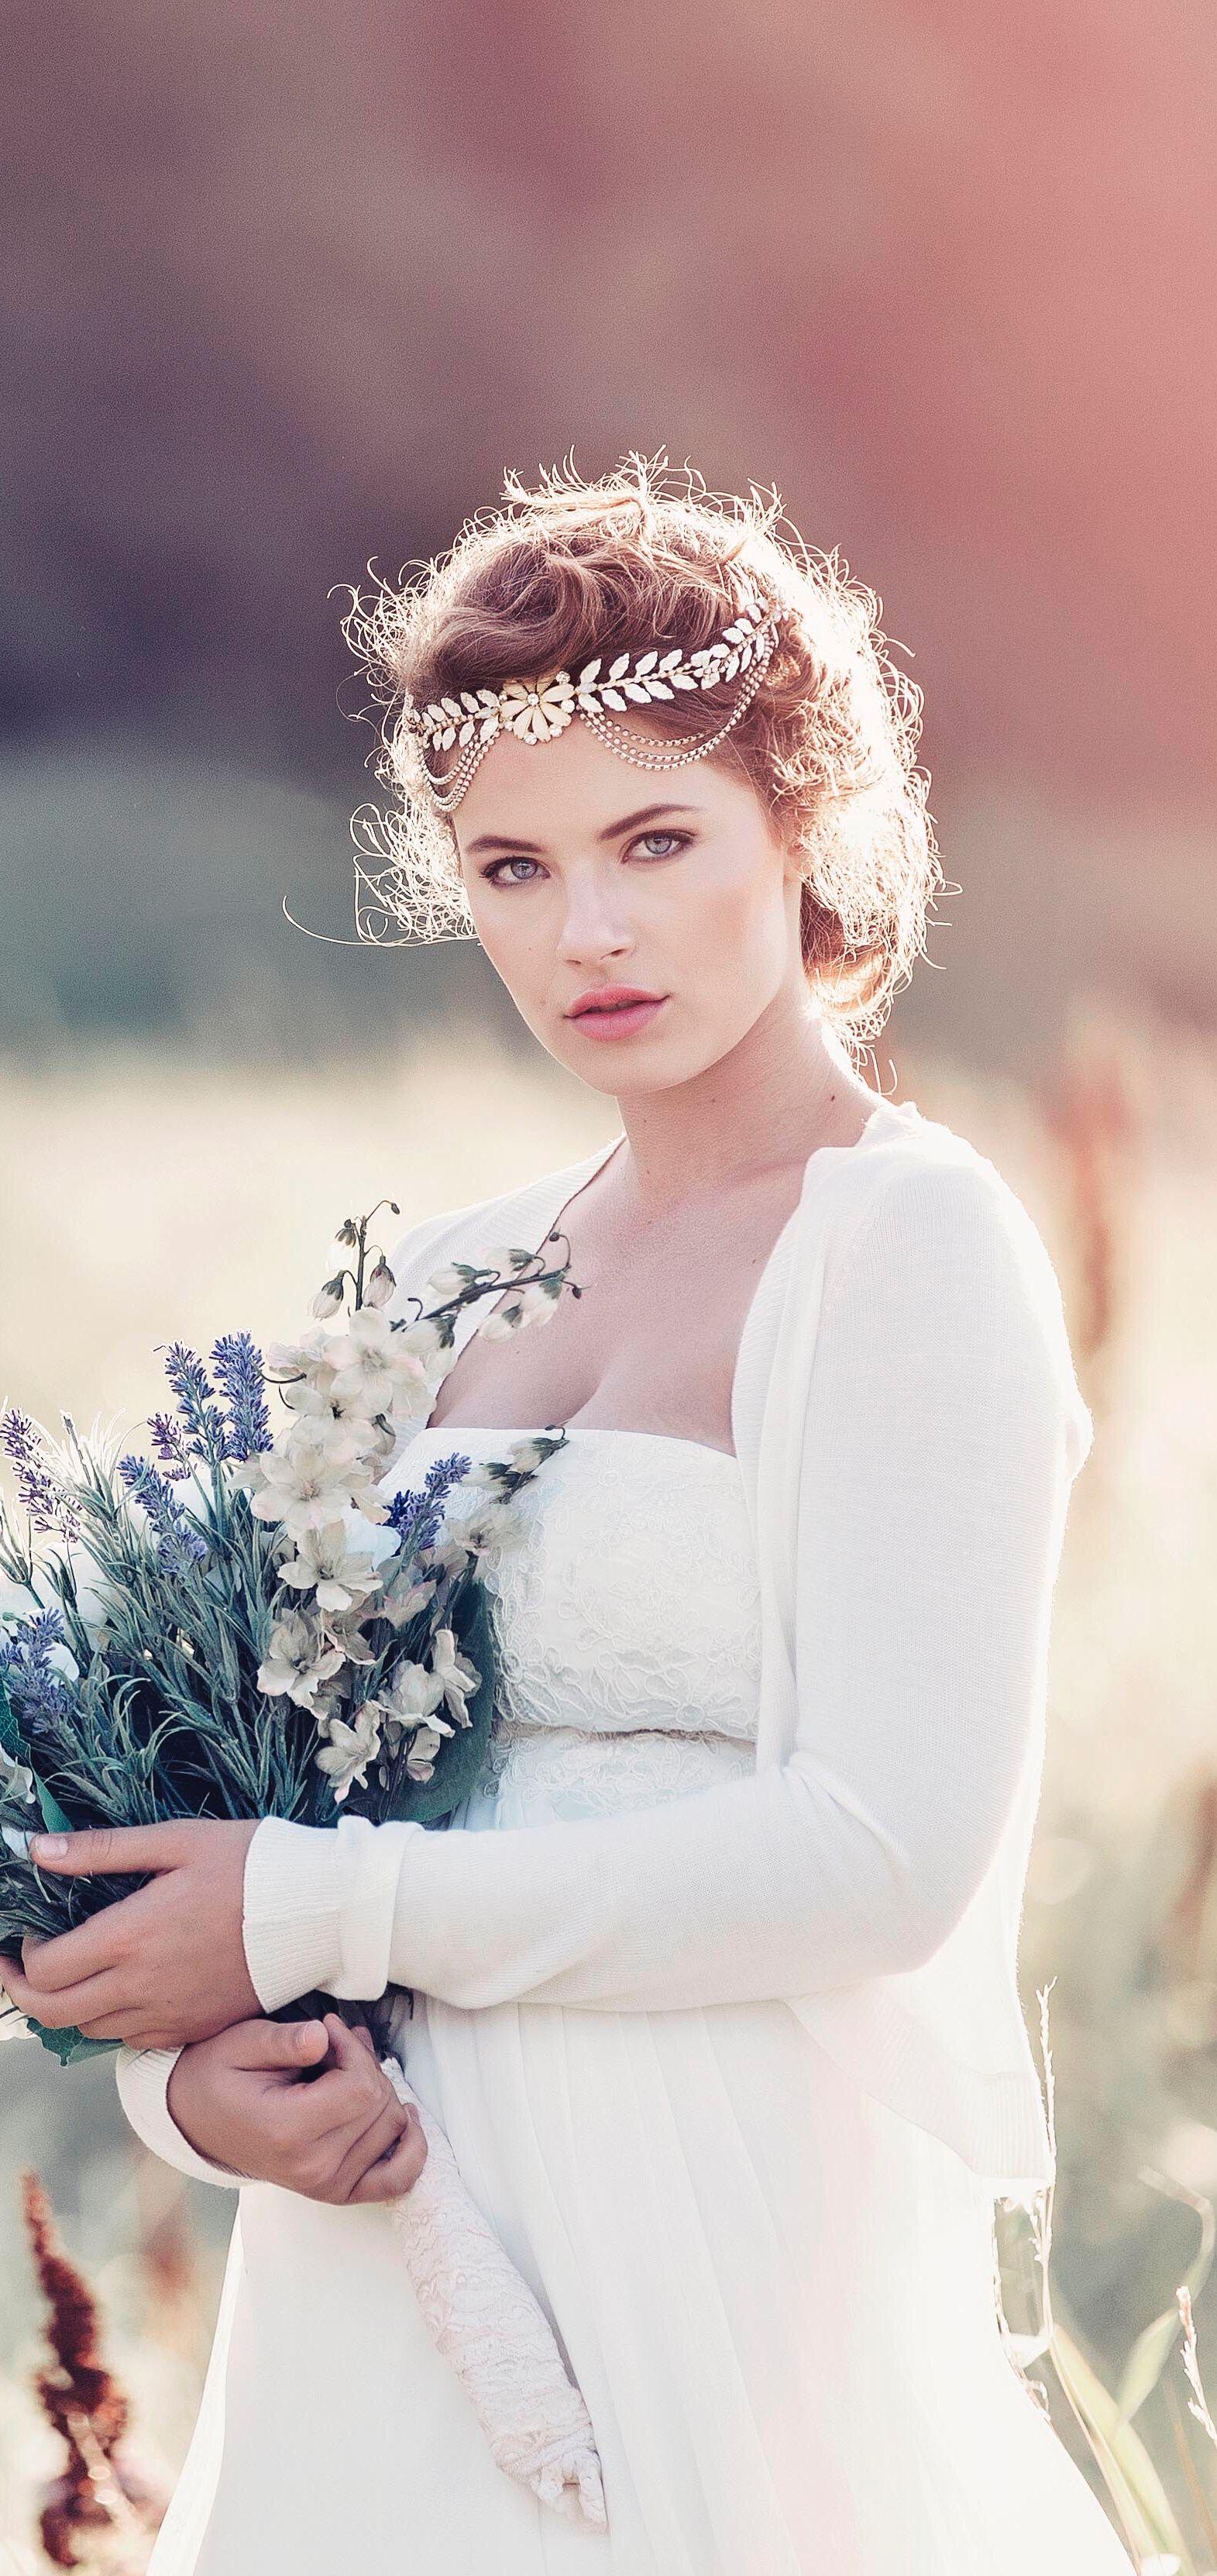 Romantic Decorative Wedding Hair Adornment Wedding Headpiece